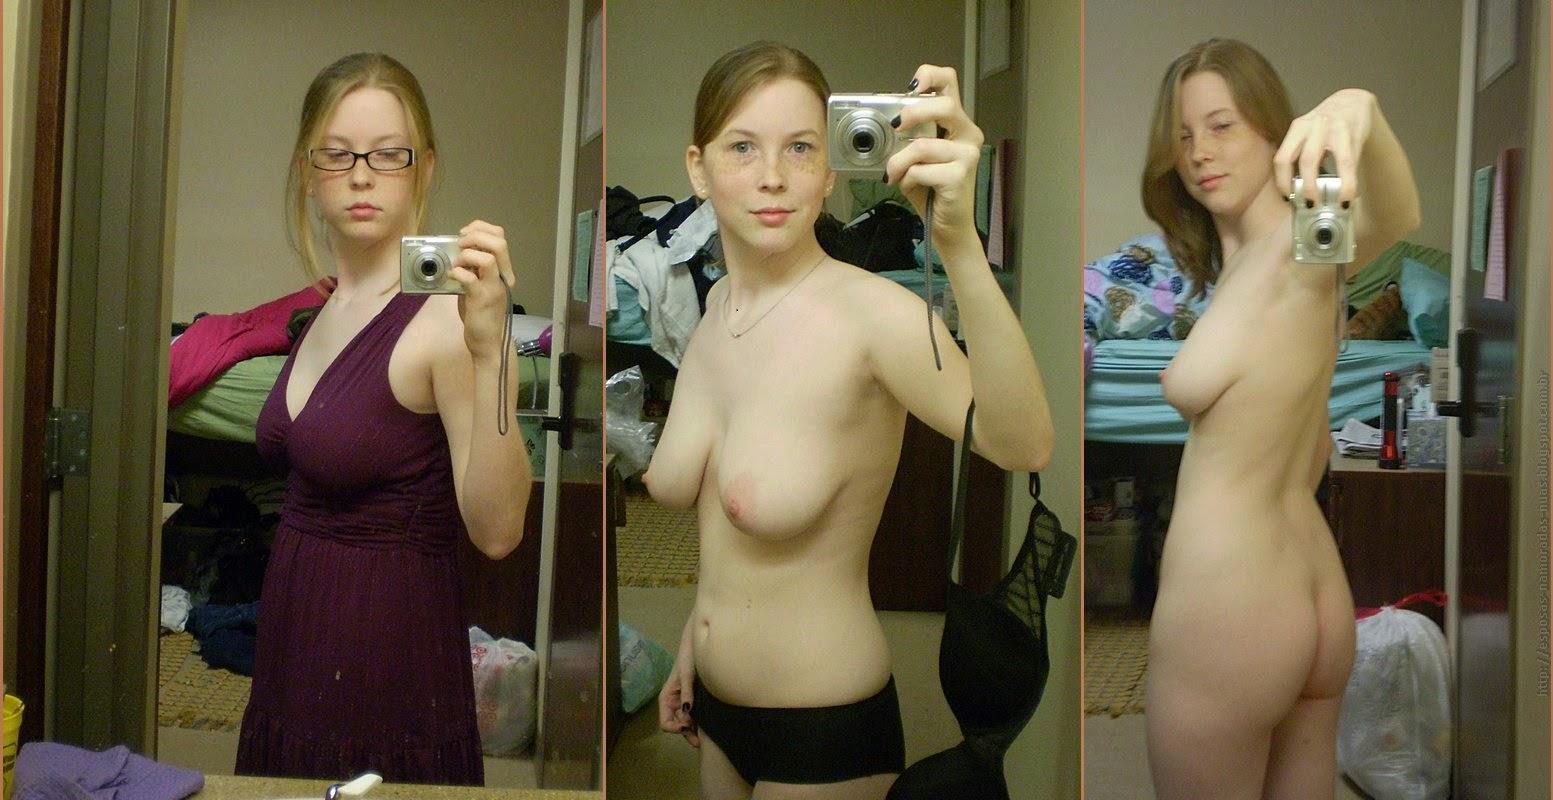 Peito feminino nu de pequeno a grande